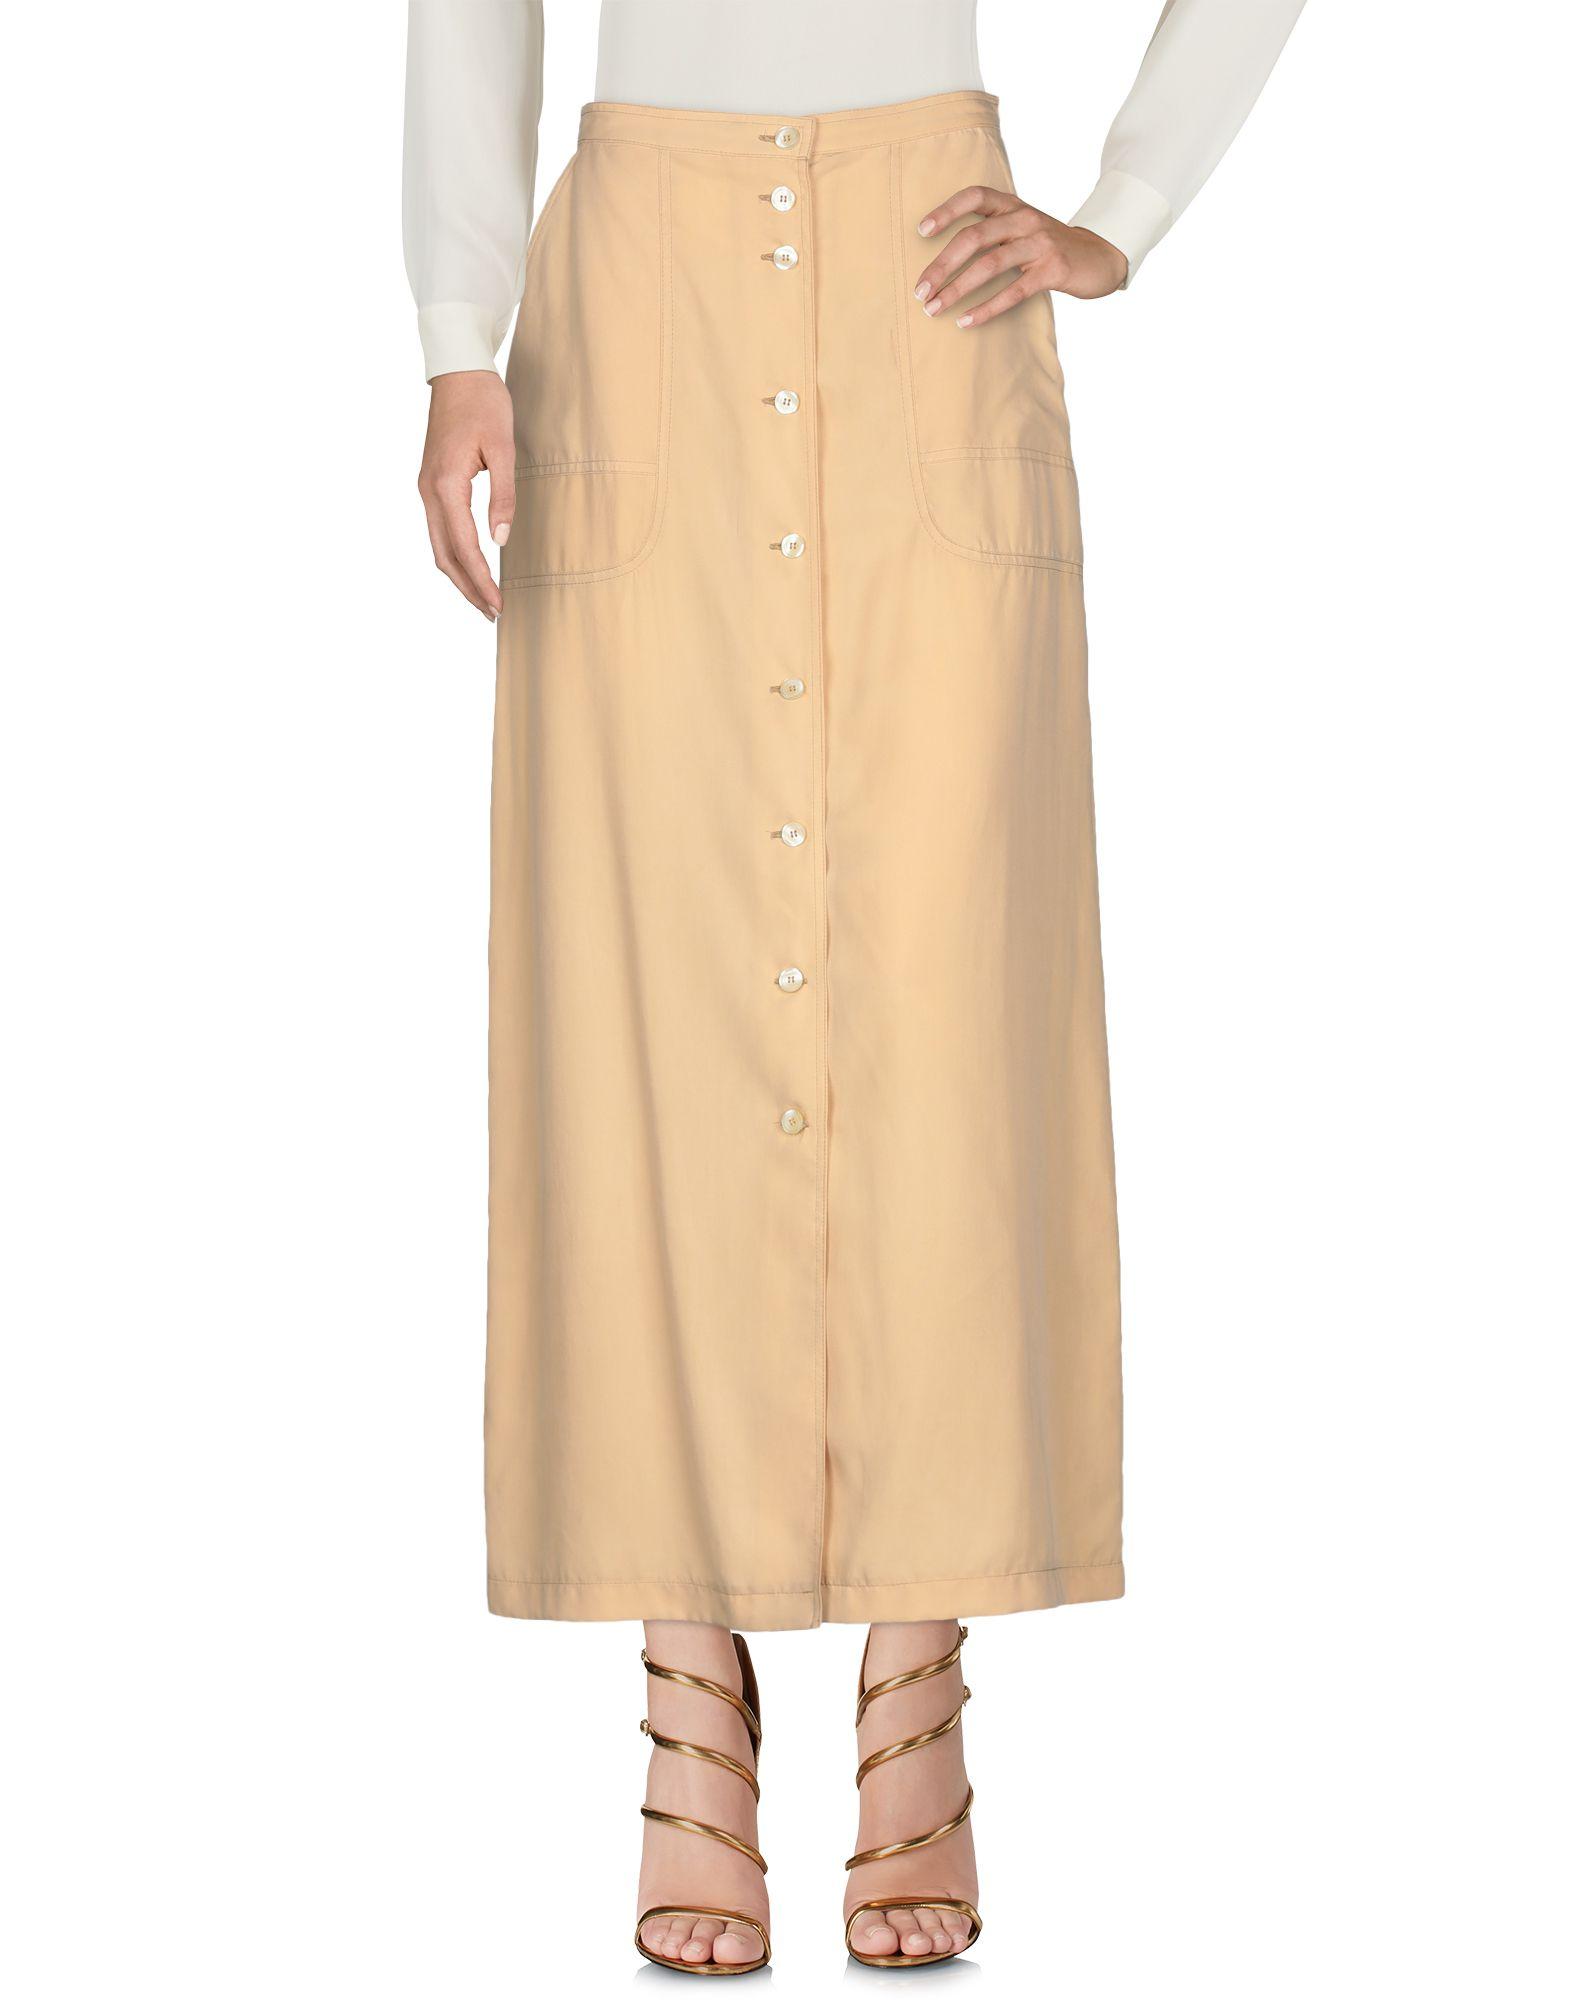 ROCCOBAROCCO JEANS Длинная юбка цены онлайн